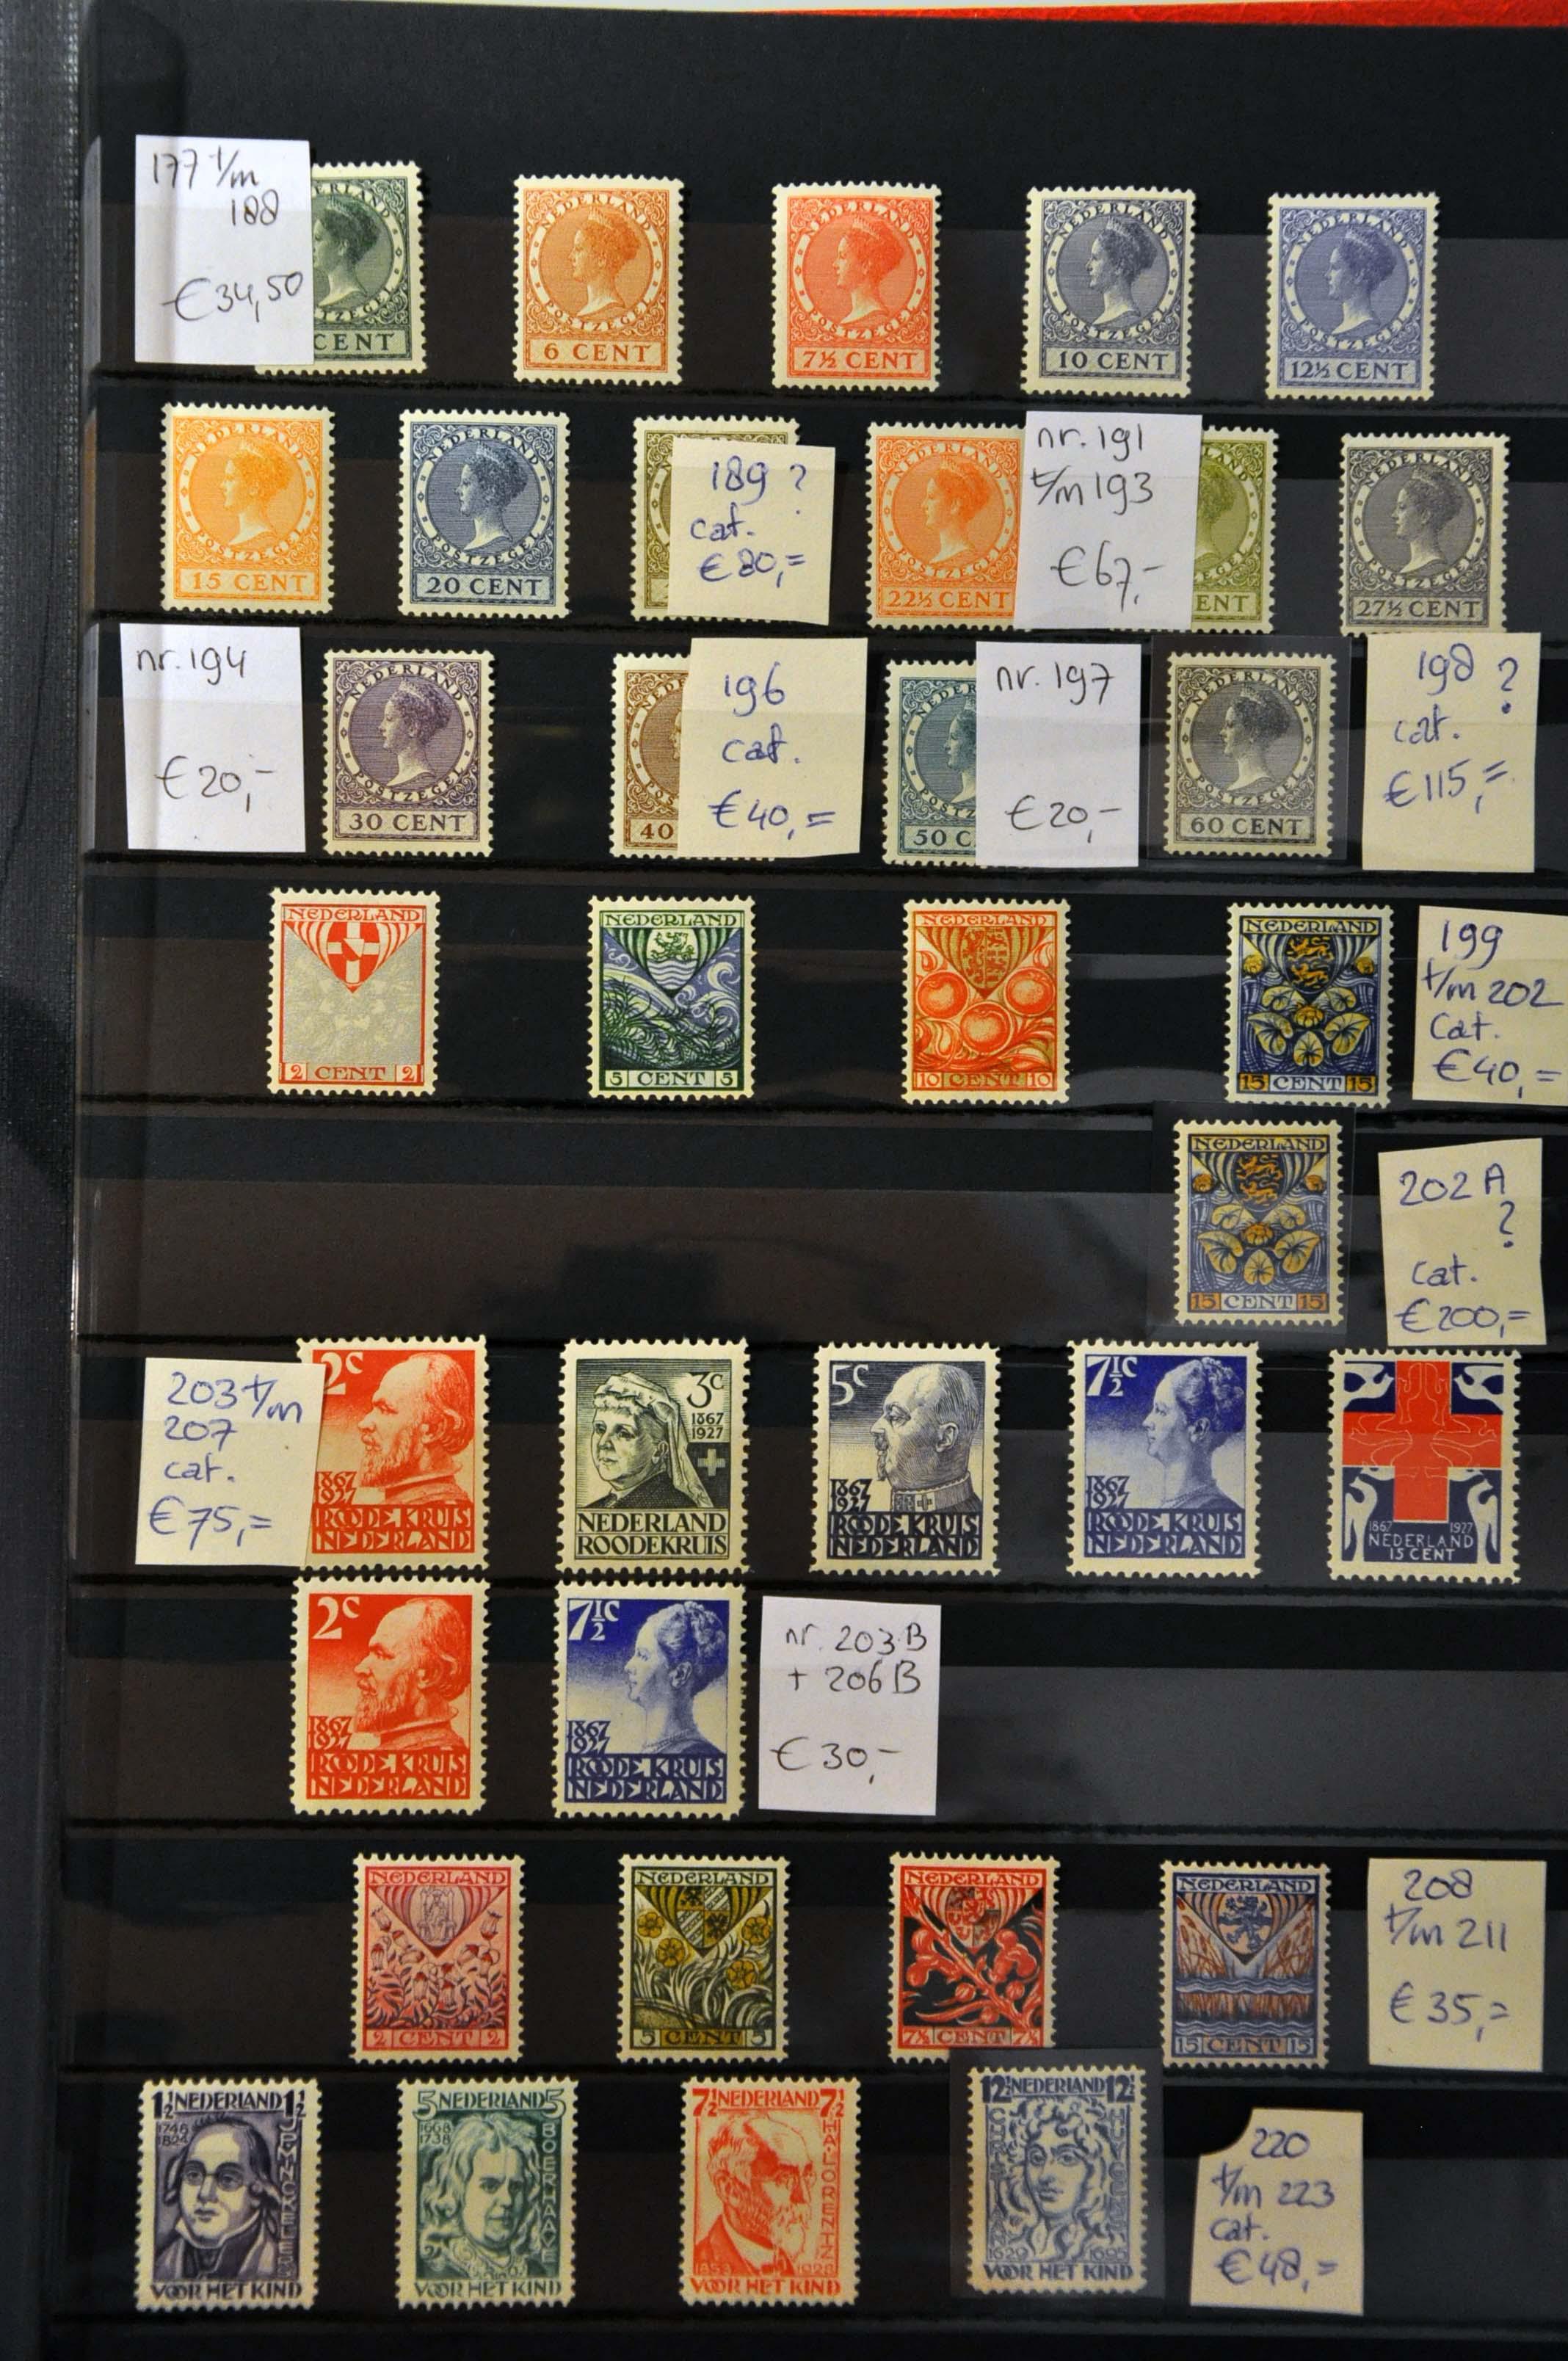 Lot 1471 - Netherlands and former colonies Netherlands -  Corinphila Veilingen Auction 239: General sale